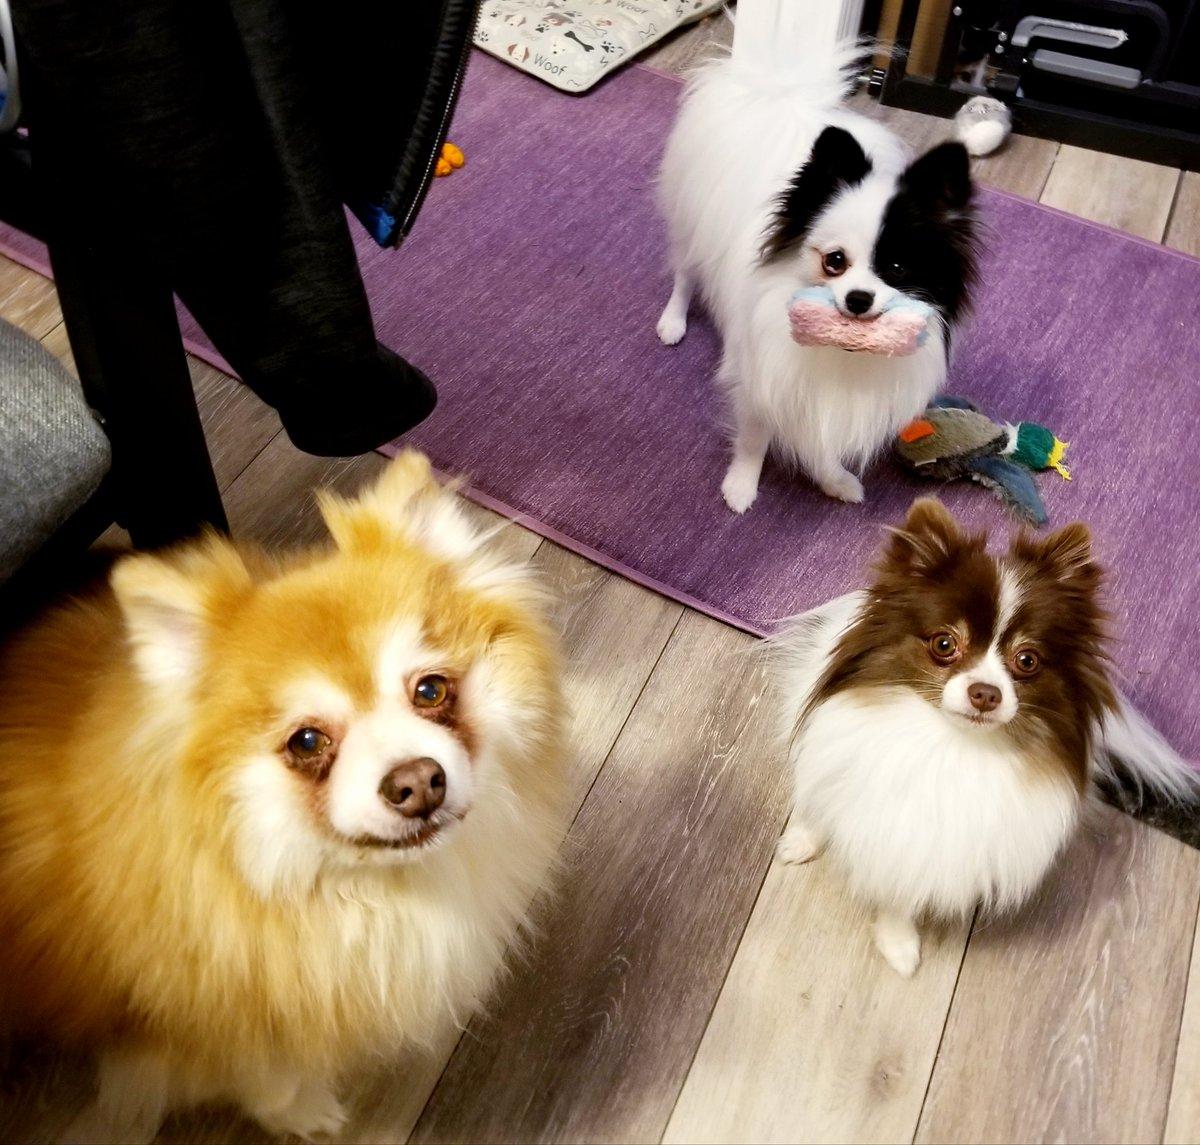 #lovepoms #lovedogs #ilovemydog #doglover #dogsrule #dogshop #dogmom #pommom #pomlife #doglife #pomeranian #pomsofinstagram #pomstagrampic.twitter.com/uBfH6vT8sG